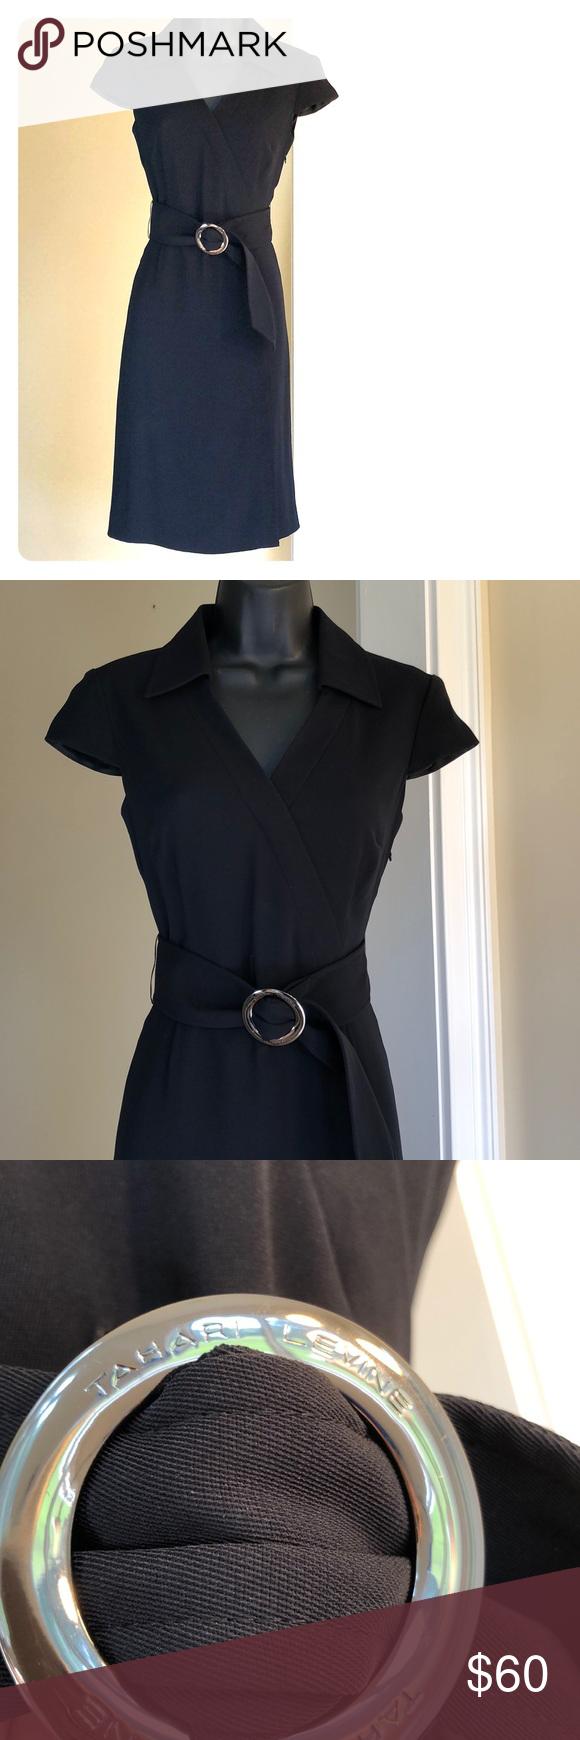 Tahari 2p Black Dress With Belt Flattering Dresses Black Dress Dresses [ 1740 x 580 Pixel ]